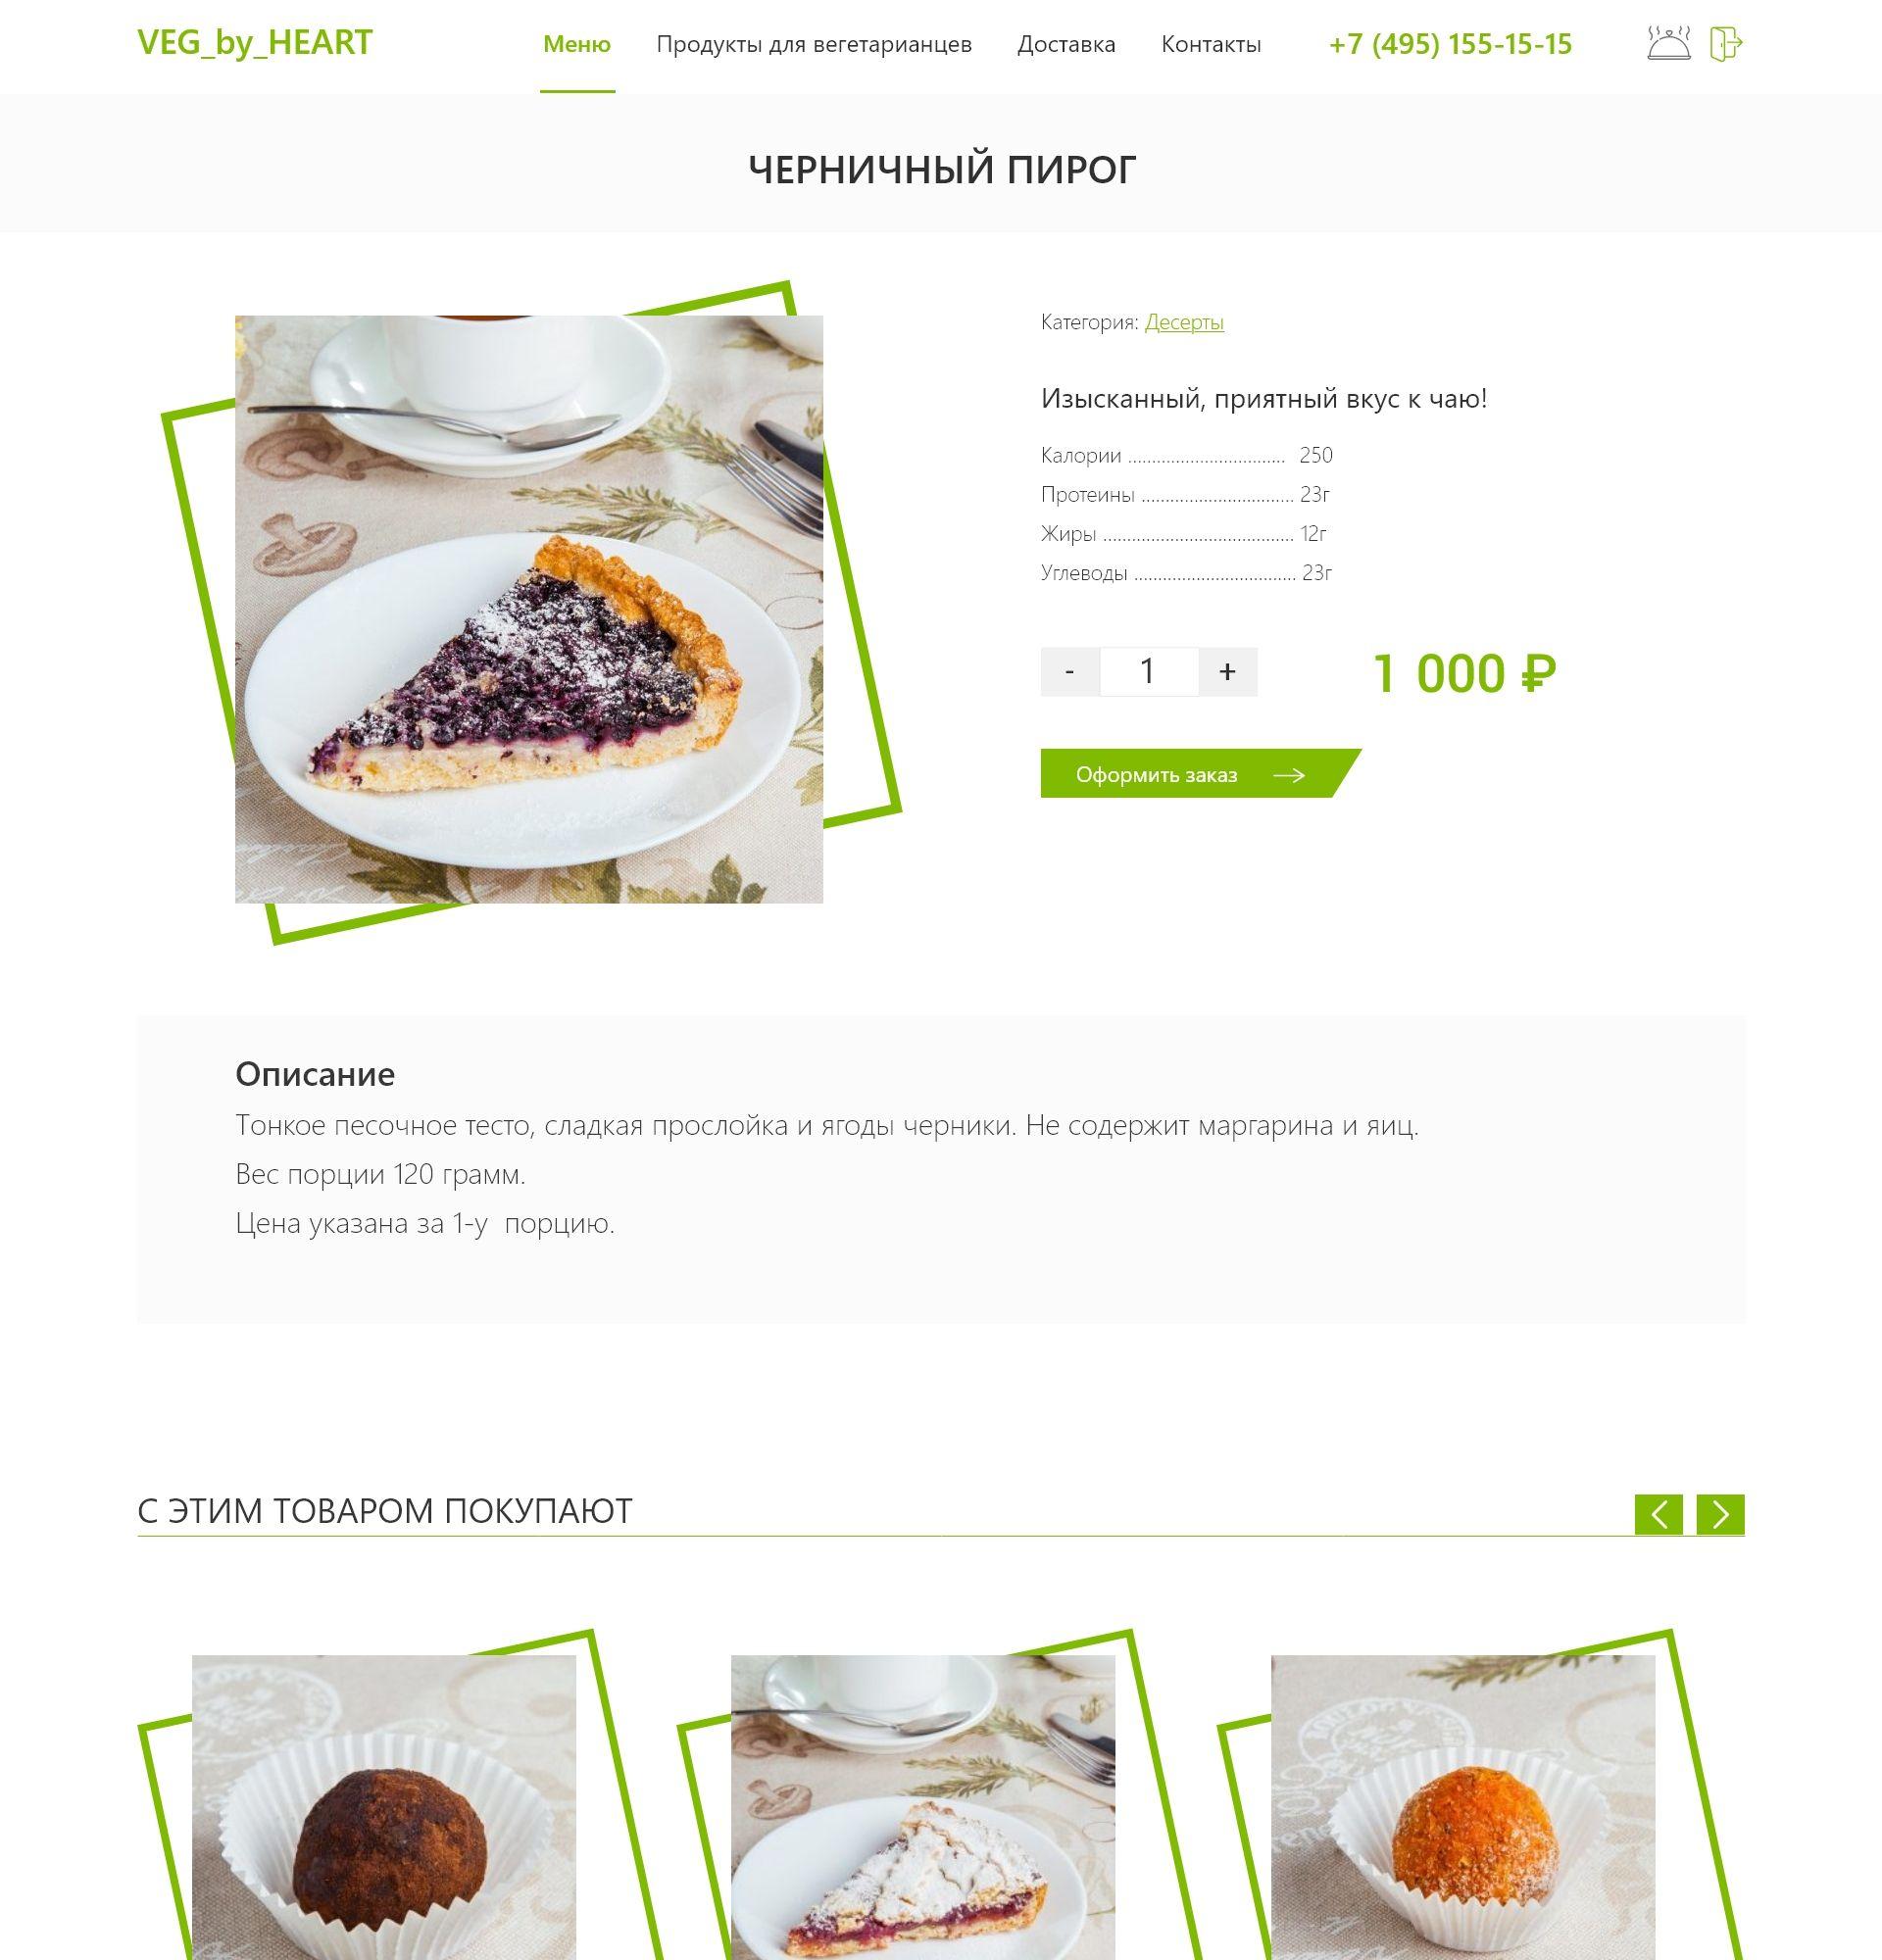 Веб-сайт для vegbyheart.ru - дизайнер Yuliya18